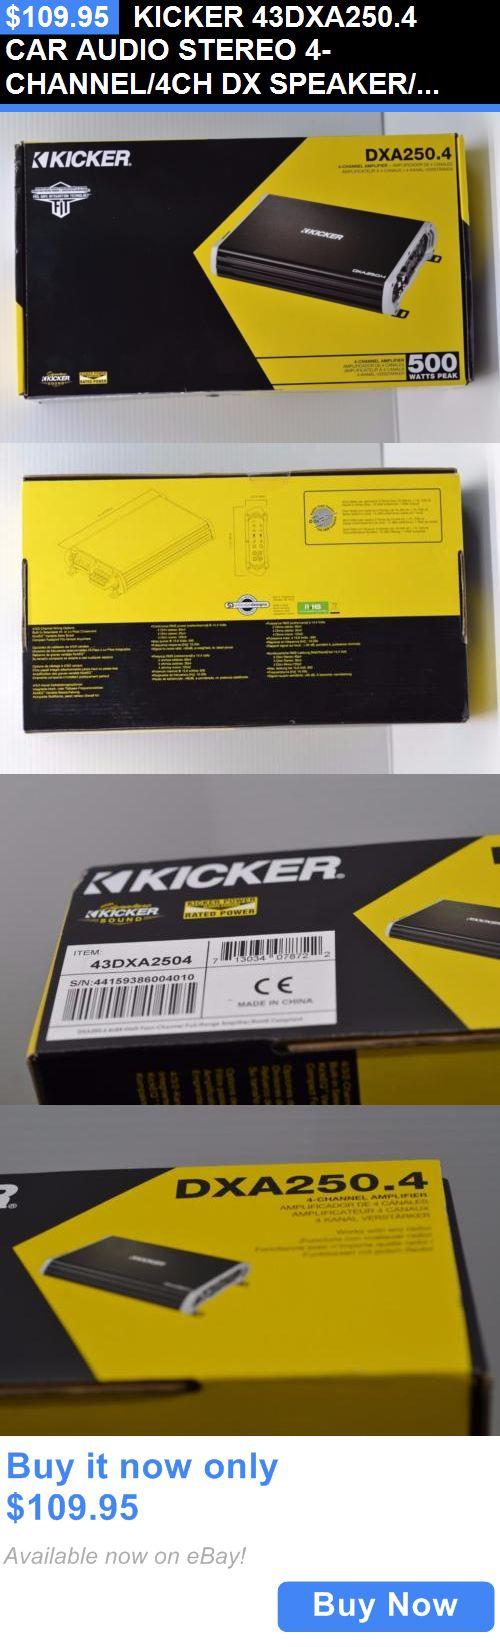 Car Amplifiers: Kicker 43Dxa250.4 Car Audio Stereo 4-Channel/4Ch Dx Speaker/Subwoofer Amplifier BUY IT NOW ONLY: $109.95